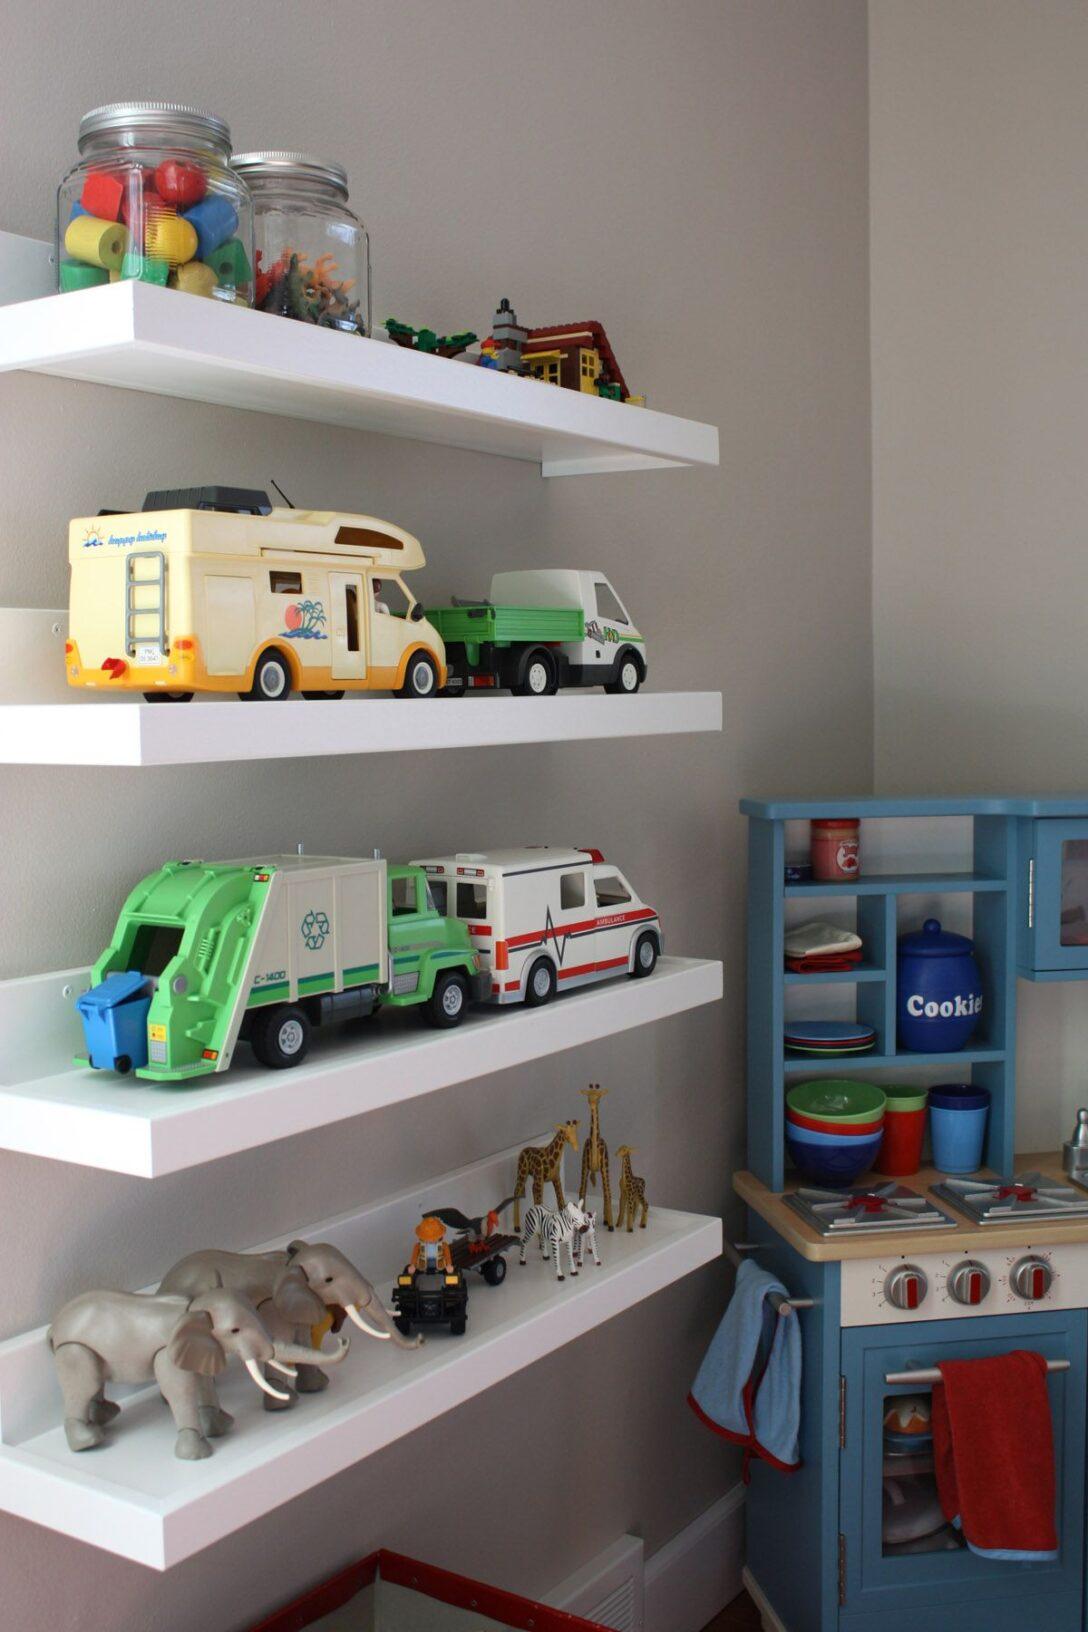 Large Size of Kinderzimmer Aufbewahrung Regal Aufbewahrungssysteme Ikea Aufbewahrungsboxen Aufbewahrungskorb Blau Aufbewahrungsregal Rosa Ideen Mint Lidl Spielzeug Gross Kinderzimmer Kinderzimmer Aufbewahrung